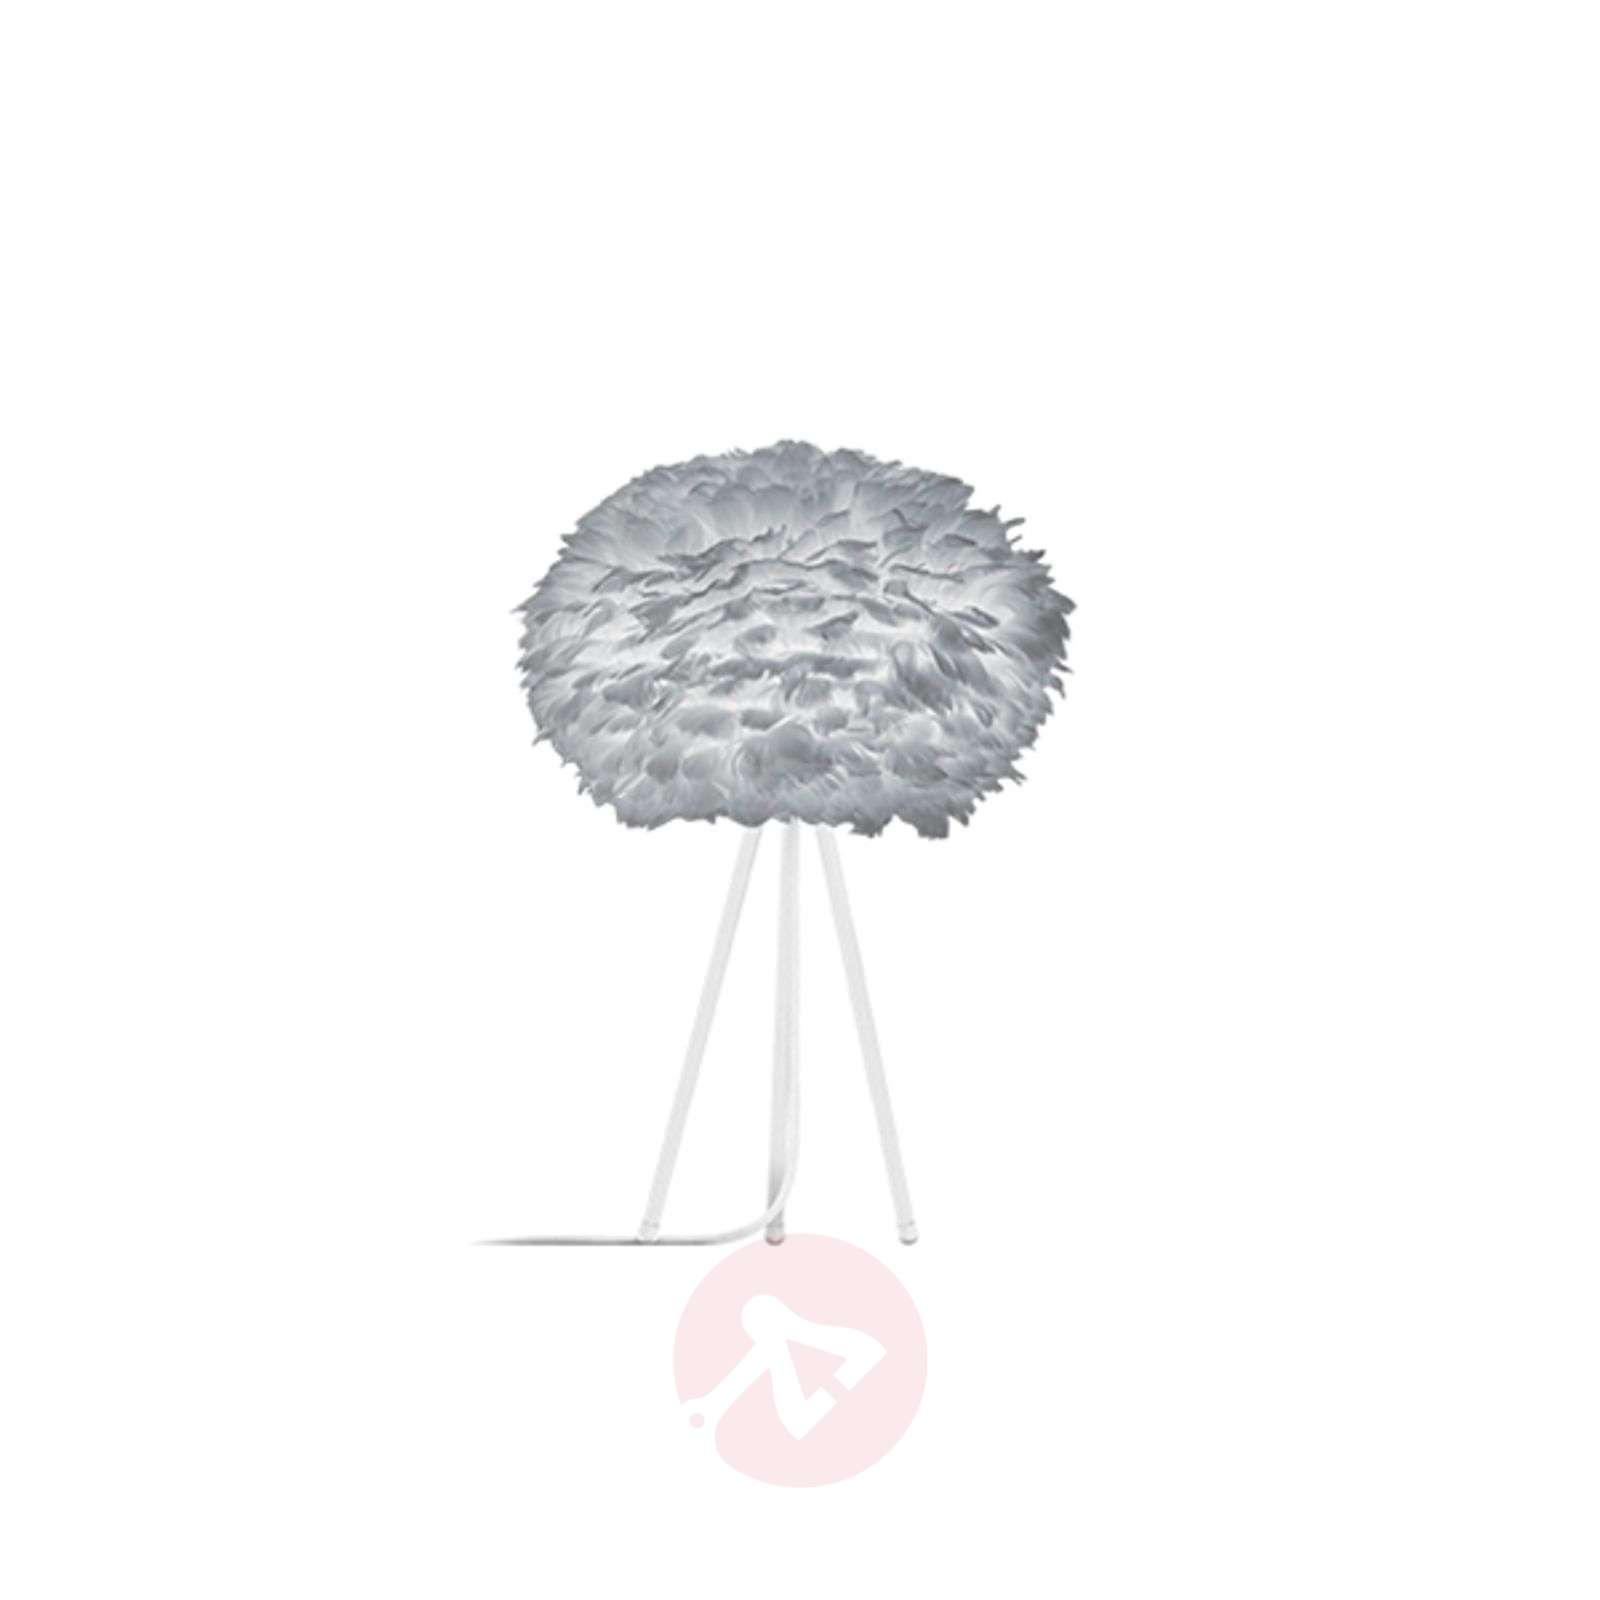 Vaaleanharmaa varjostin – pöytävalaisin Eos medium-9521143-01